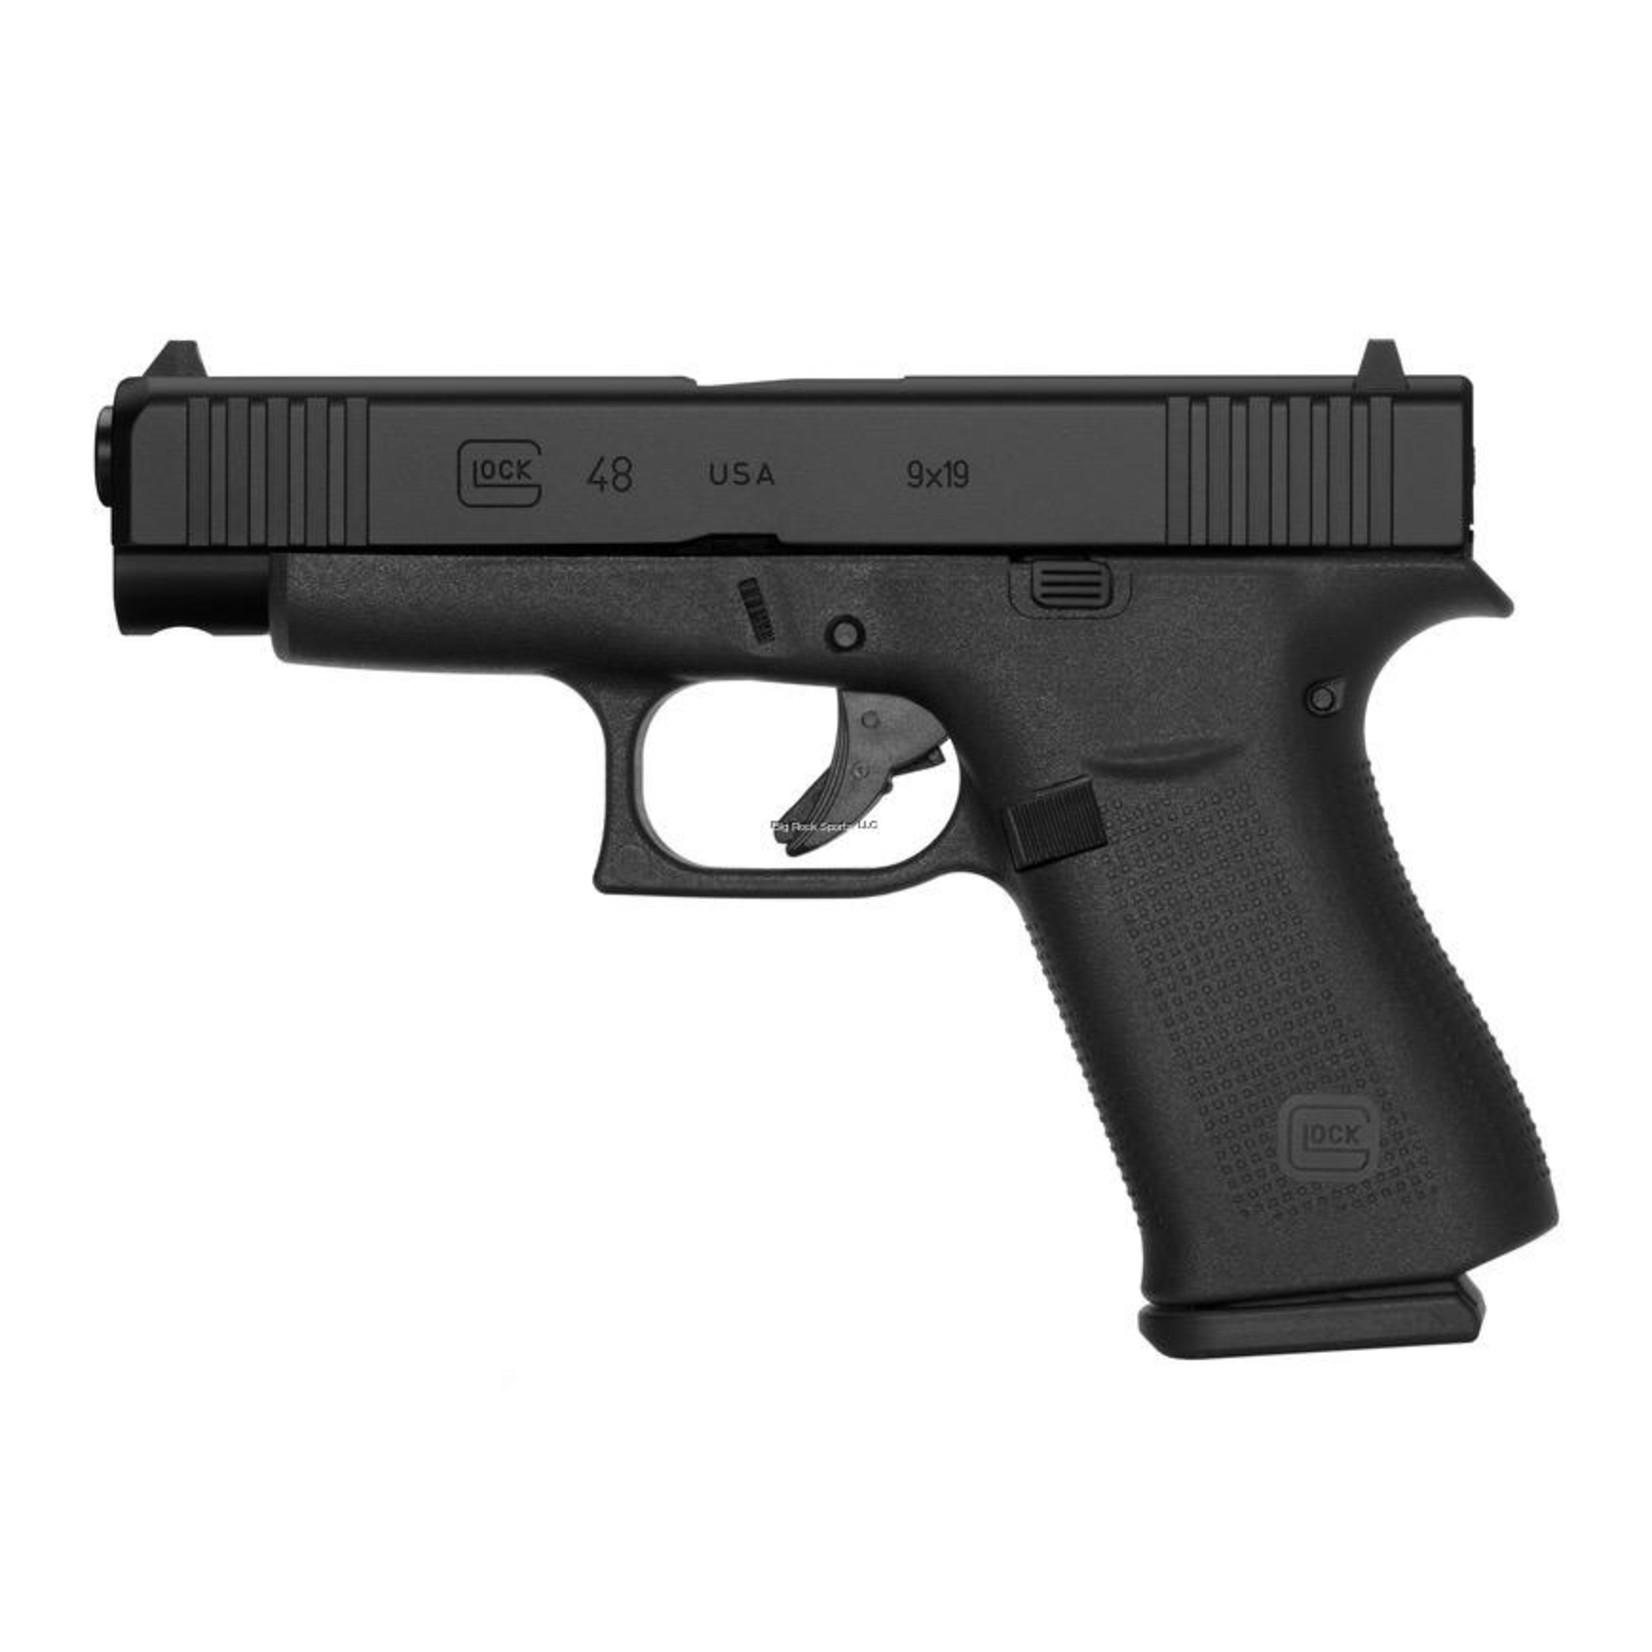 Glock Glock 48 9x19 Slim Line Fixed Sights, Black